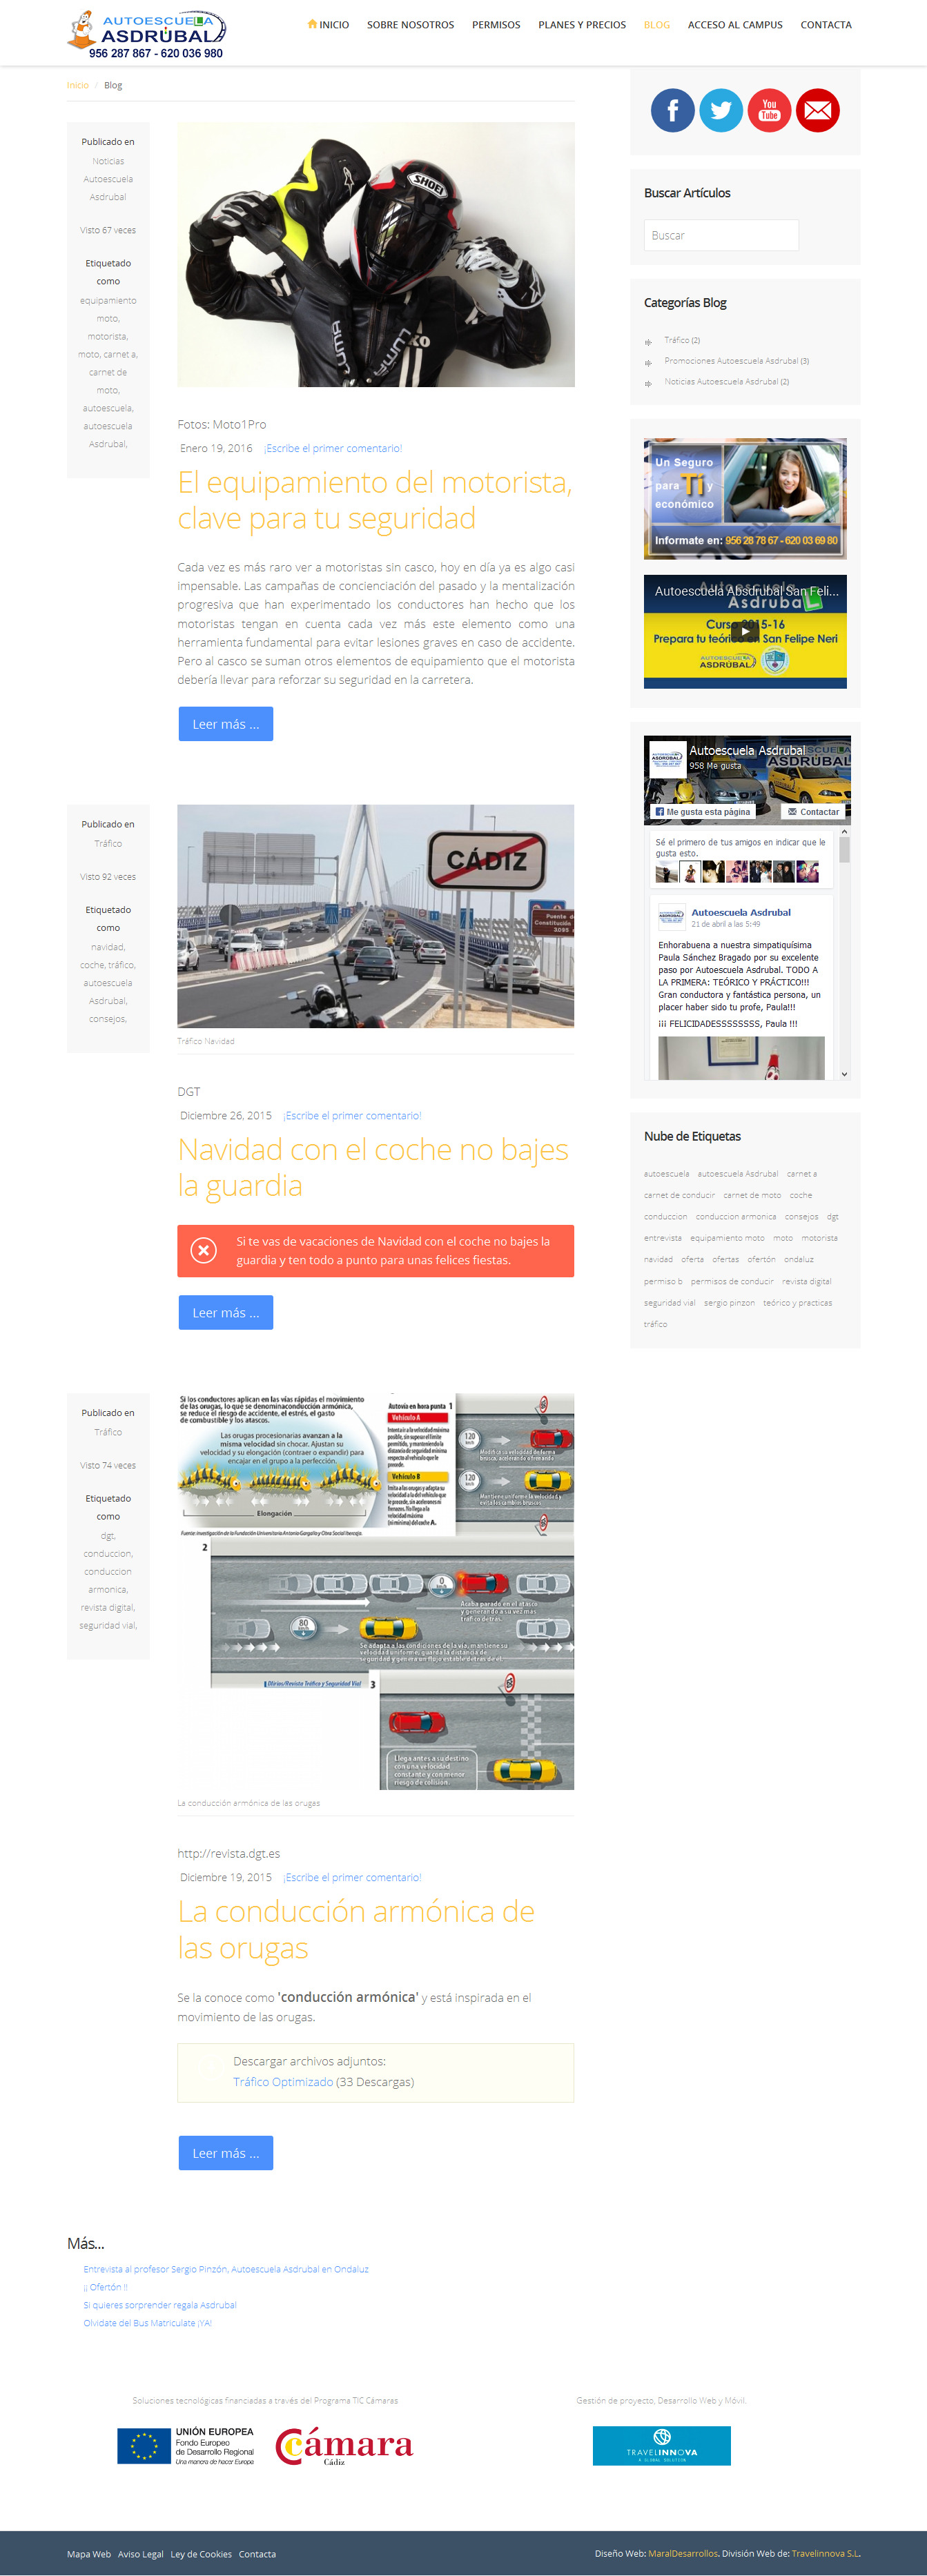 005-autoescuela-asadrubal-cadiz-blog